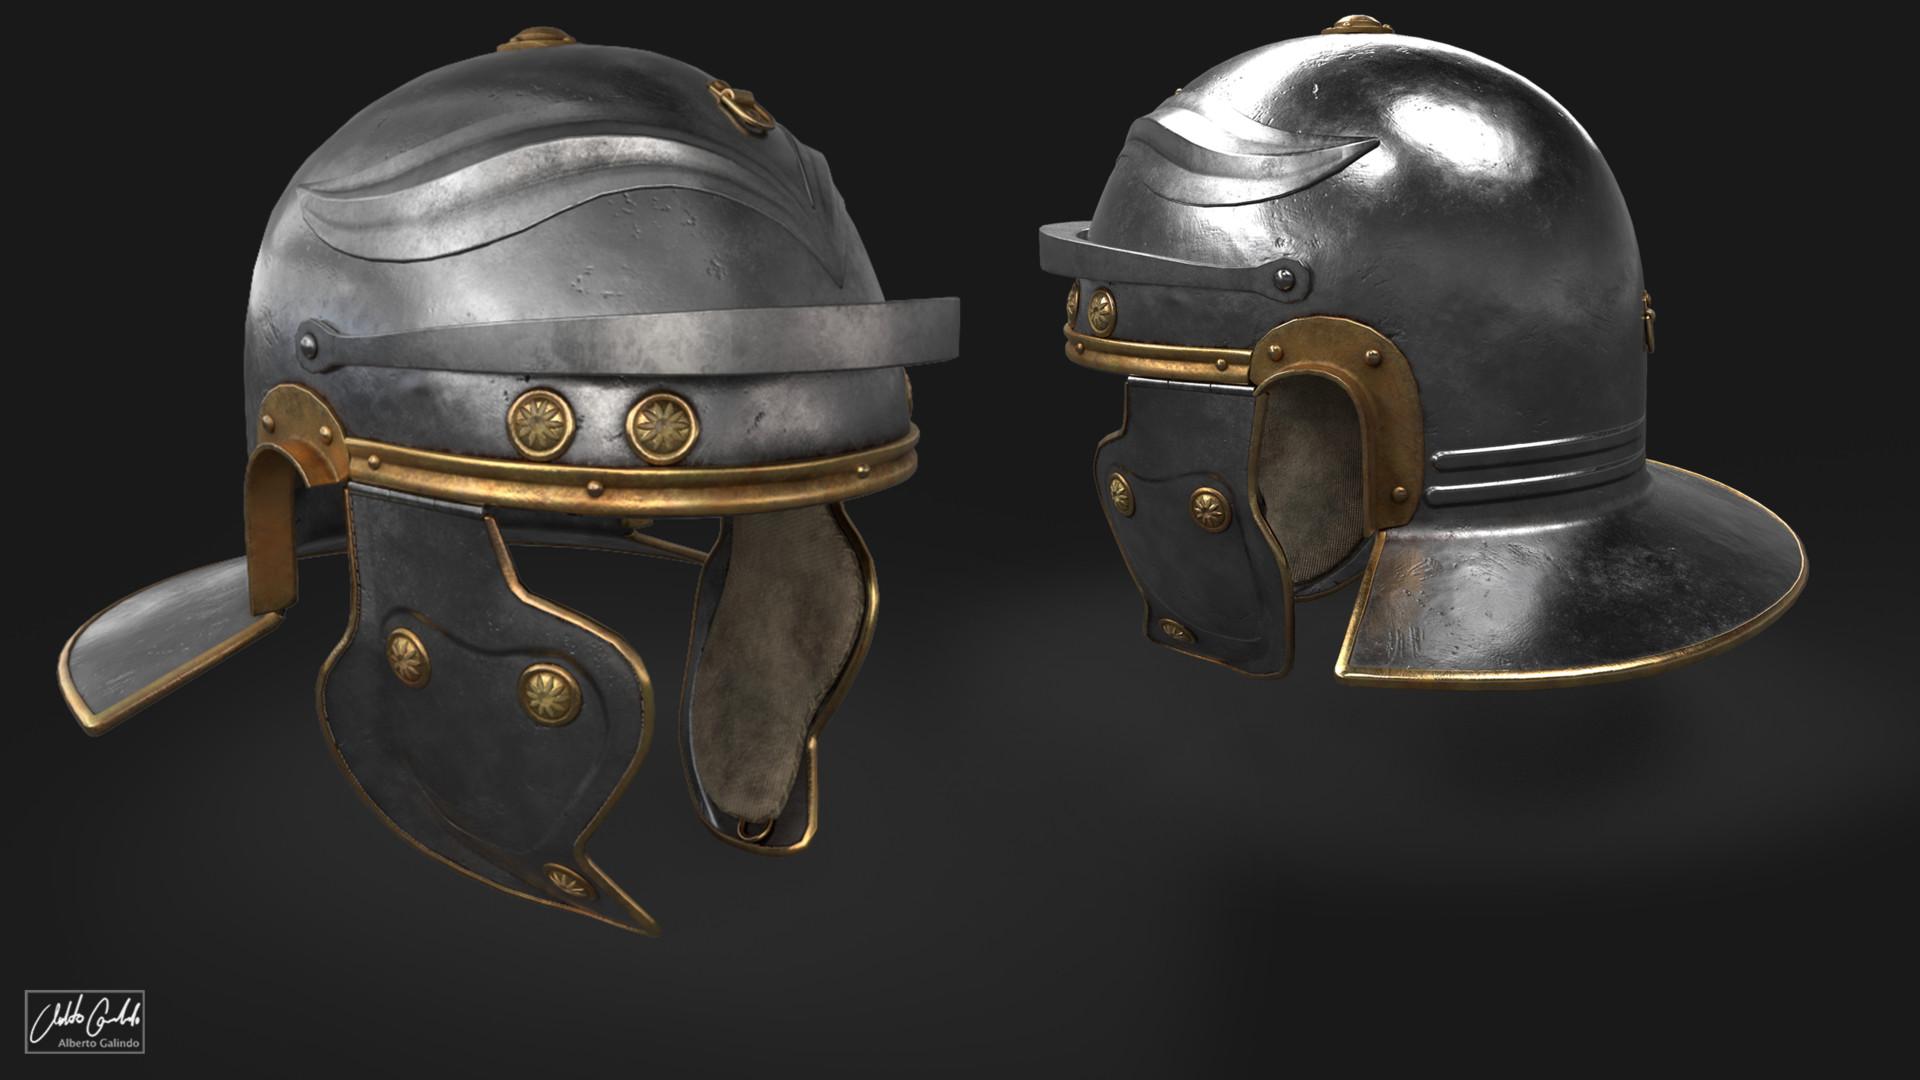 Roman Imperial Helmet Template - Honoursboards.co.uk